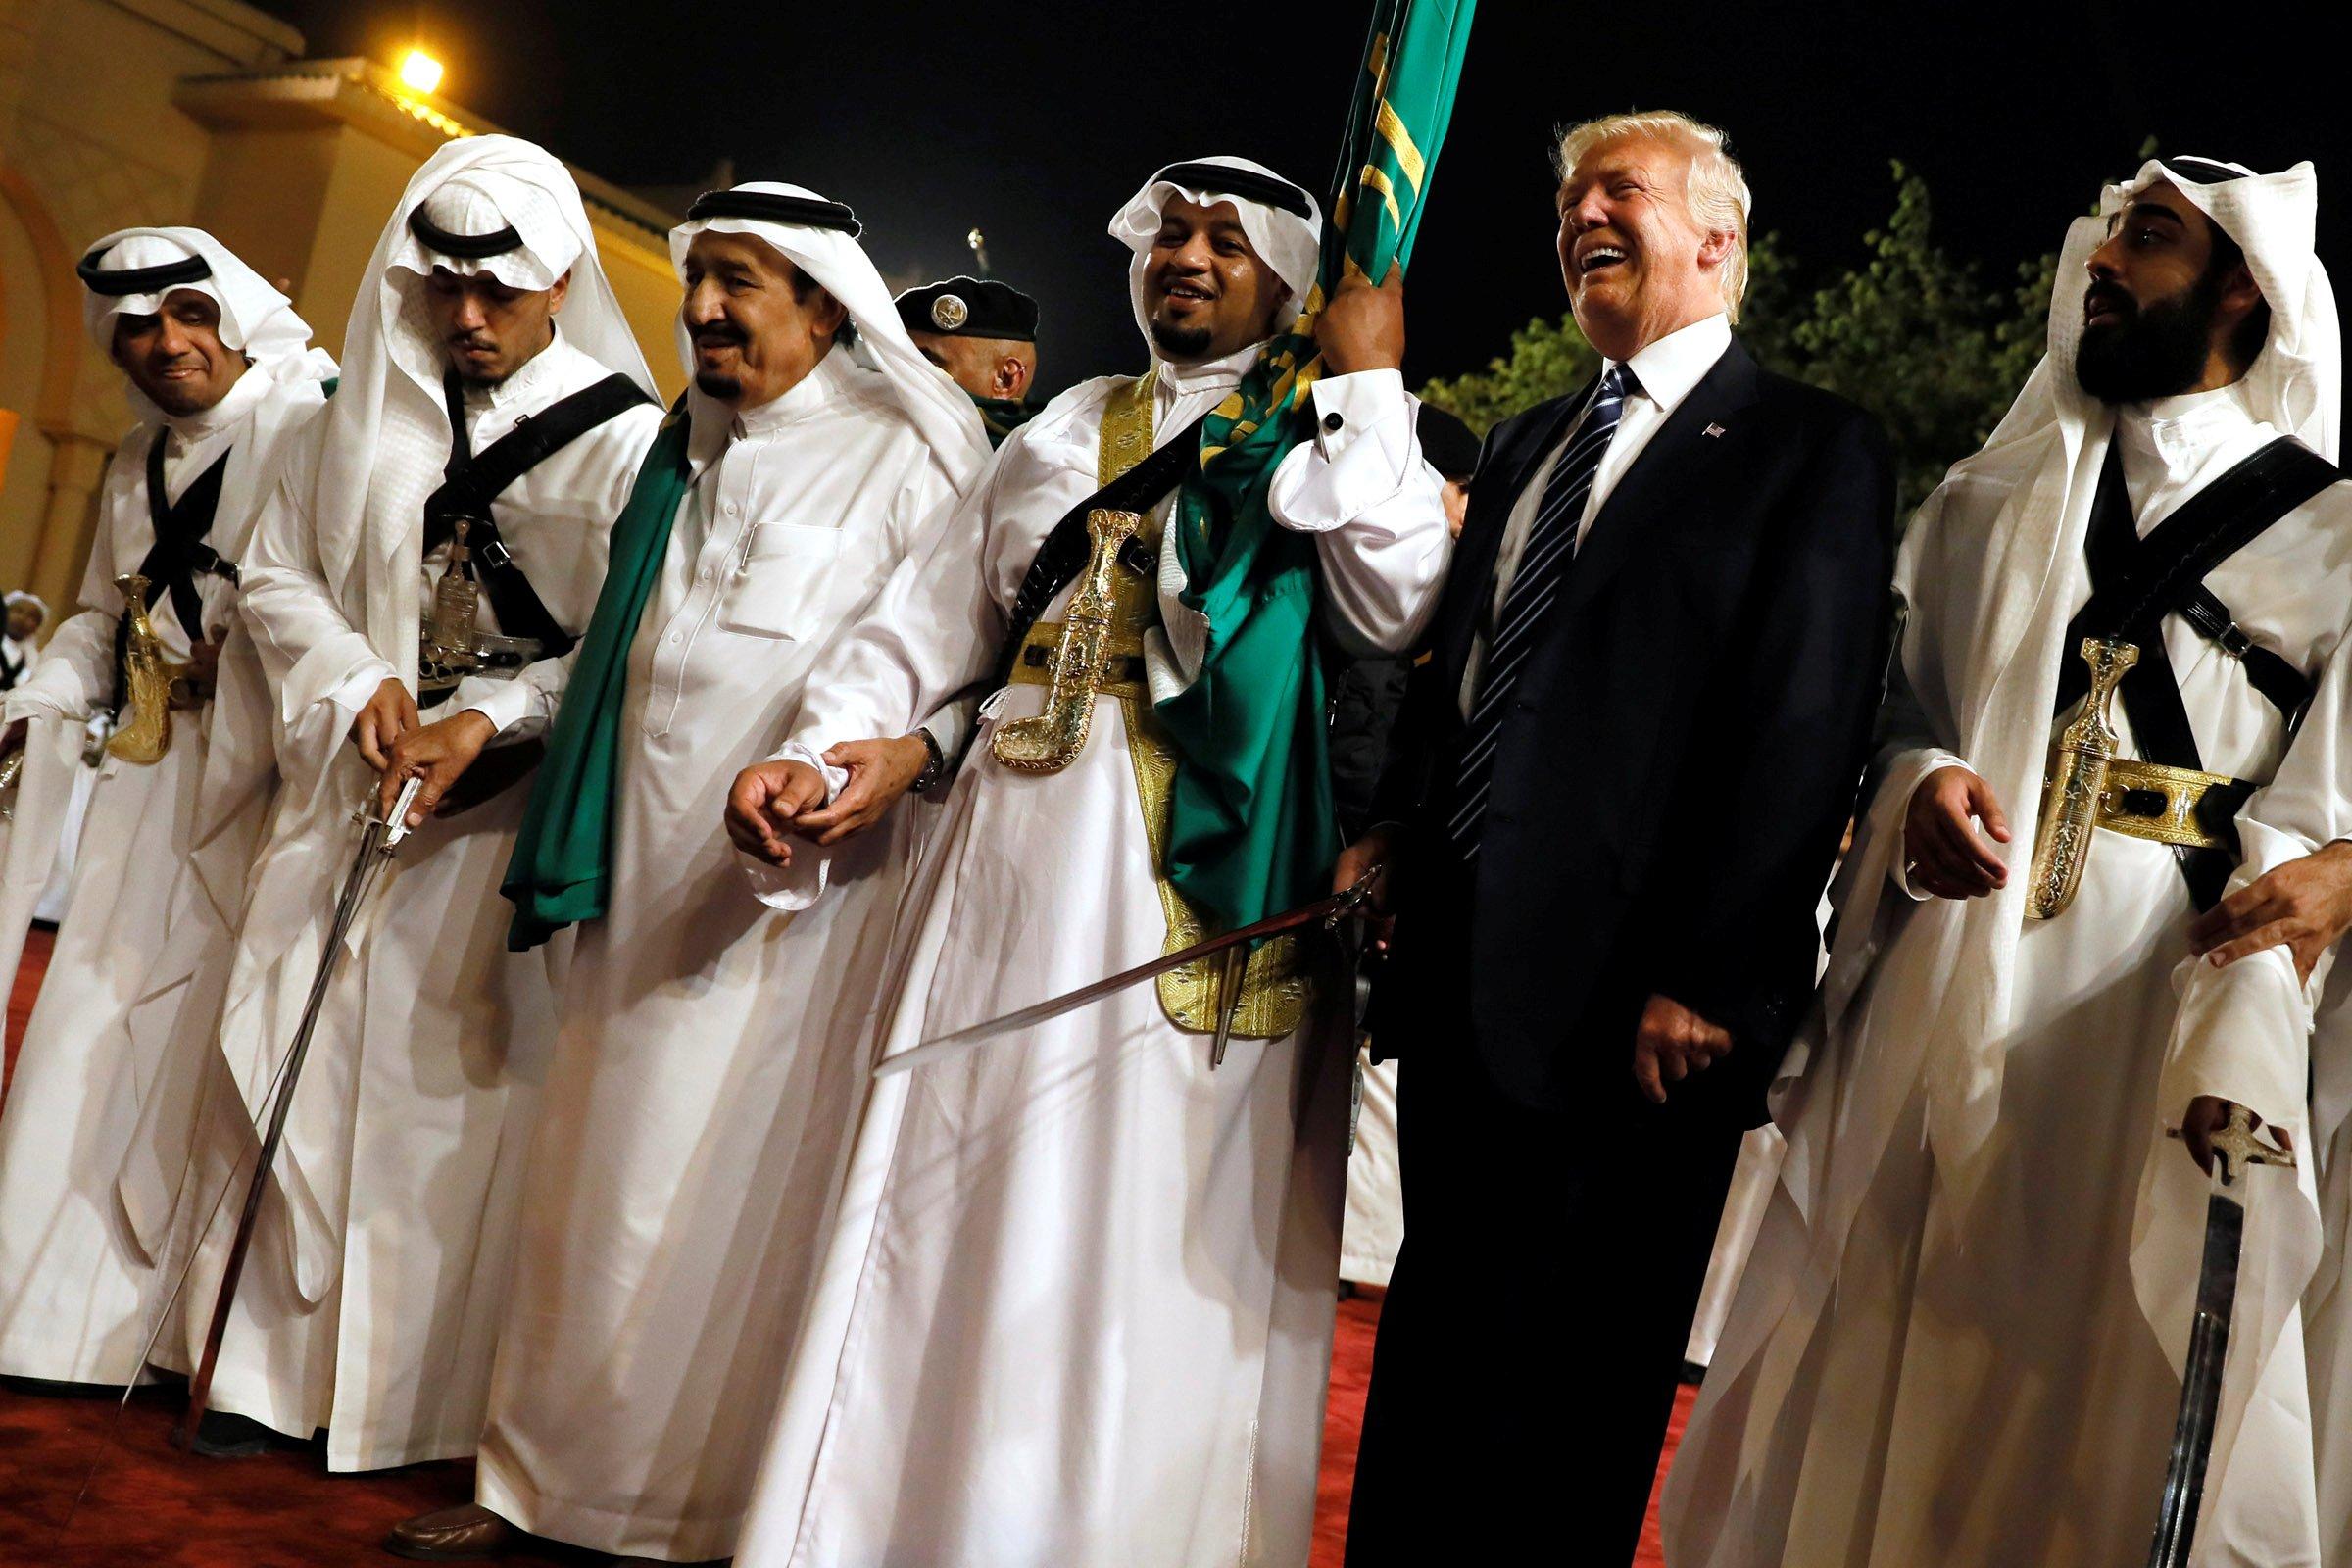 Trump in Saudi Arabia ... Ivanka Trump Supporters